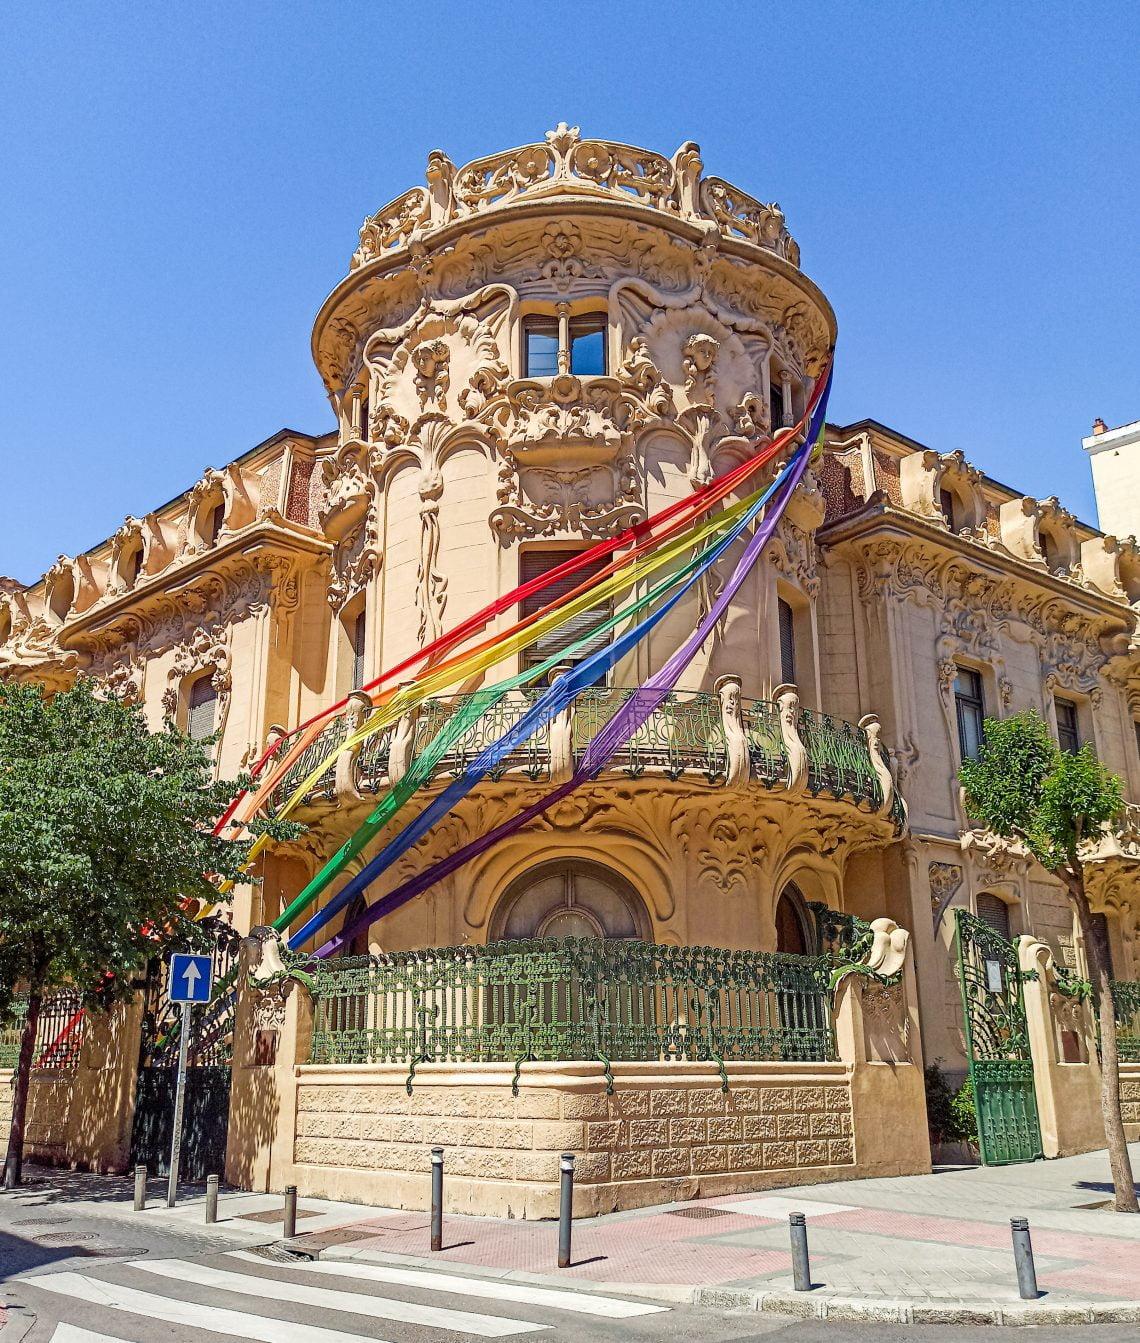 Palacio Longoria Orgullo LGBT+ Madrid 2021